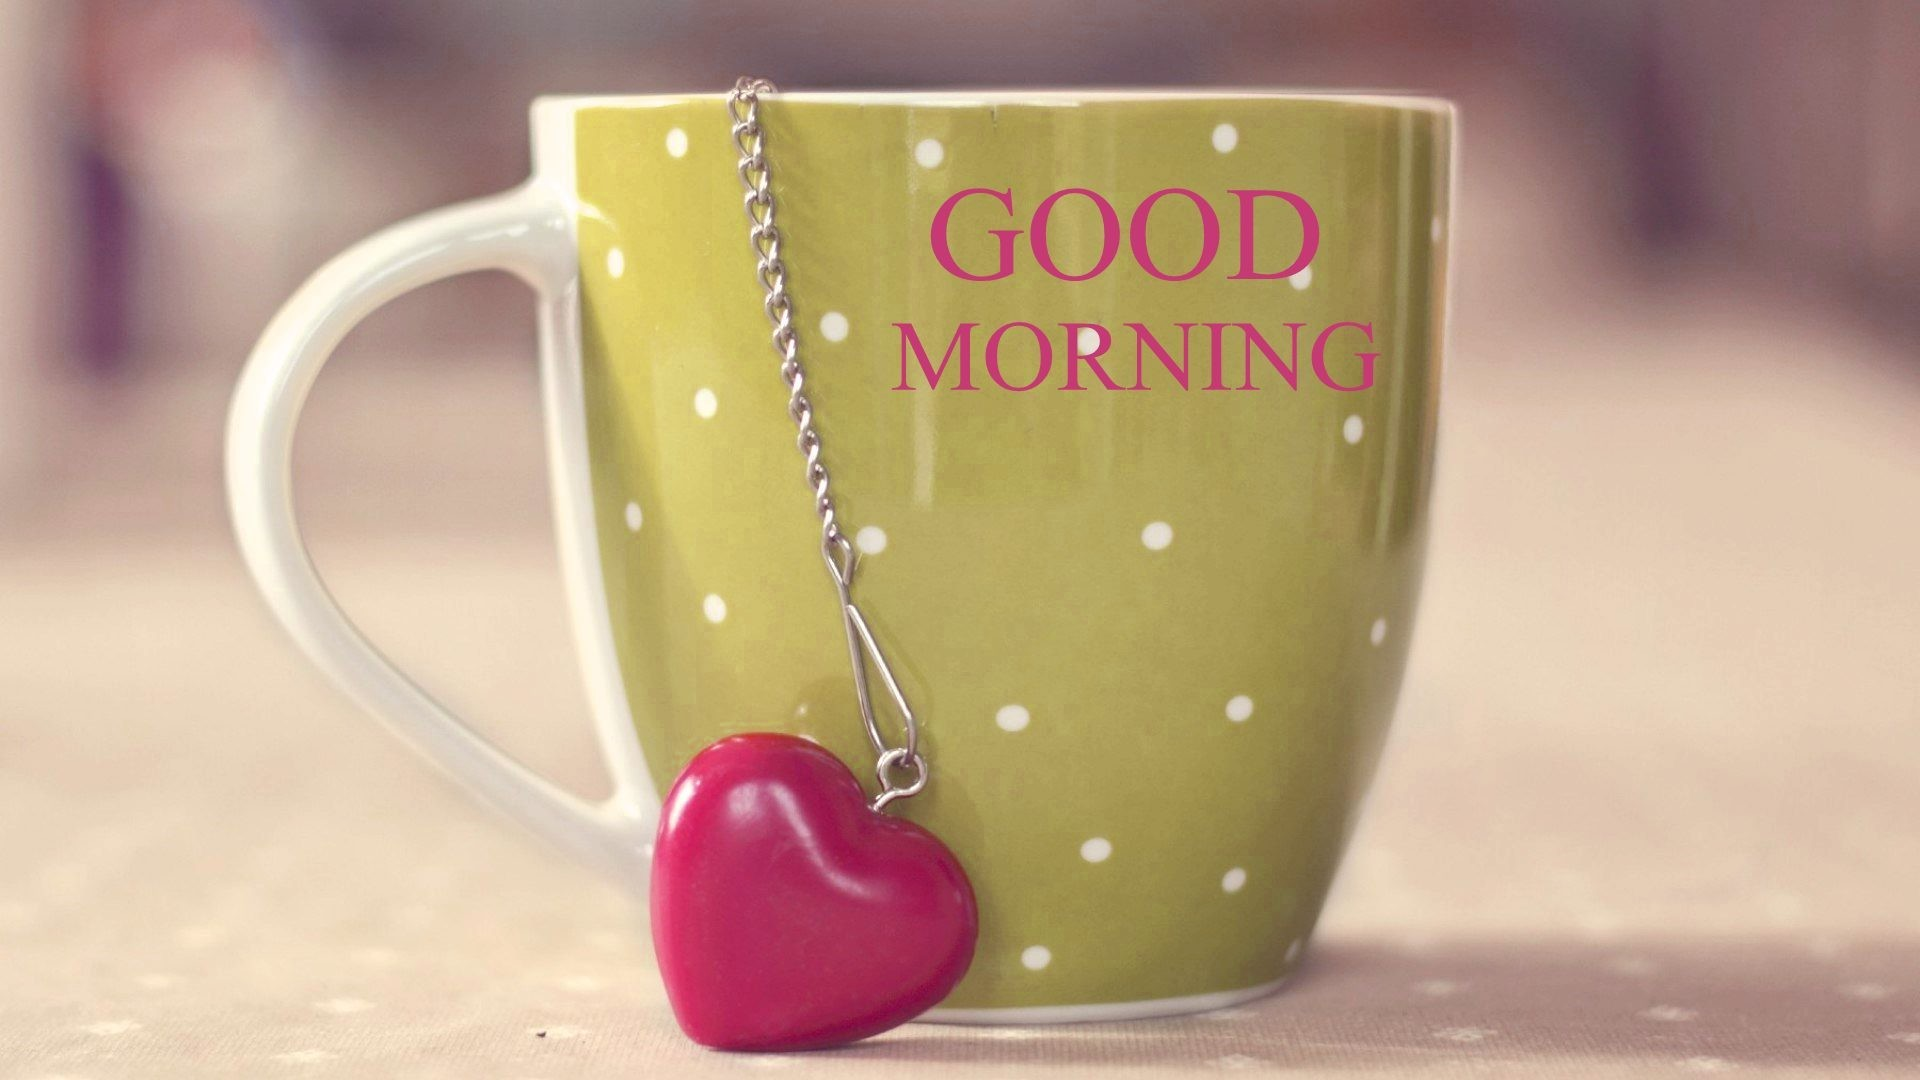 New Good Morning Wallpaper 62 Images